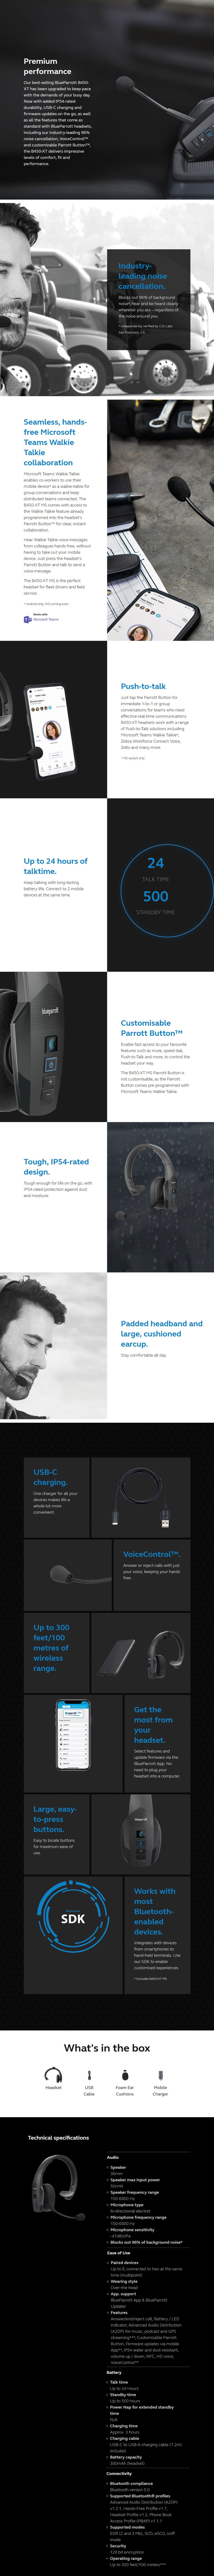 Jabra BlueParrott B450-XT USB-C Bluetooth Headset - Overview 1